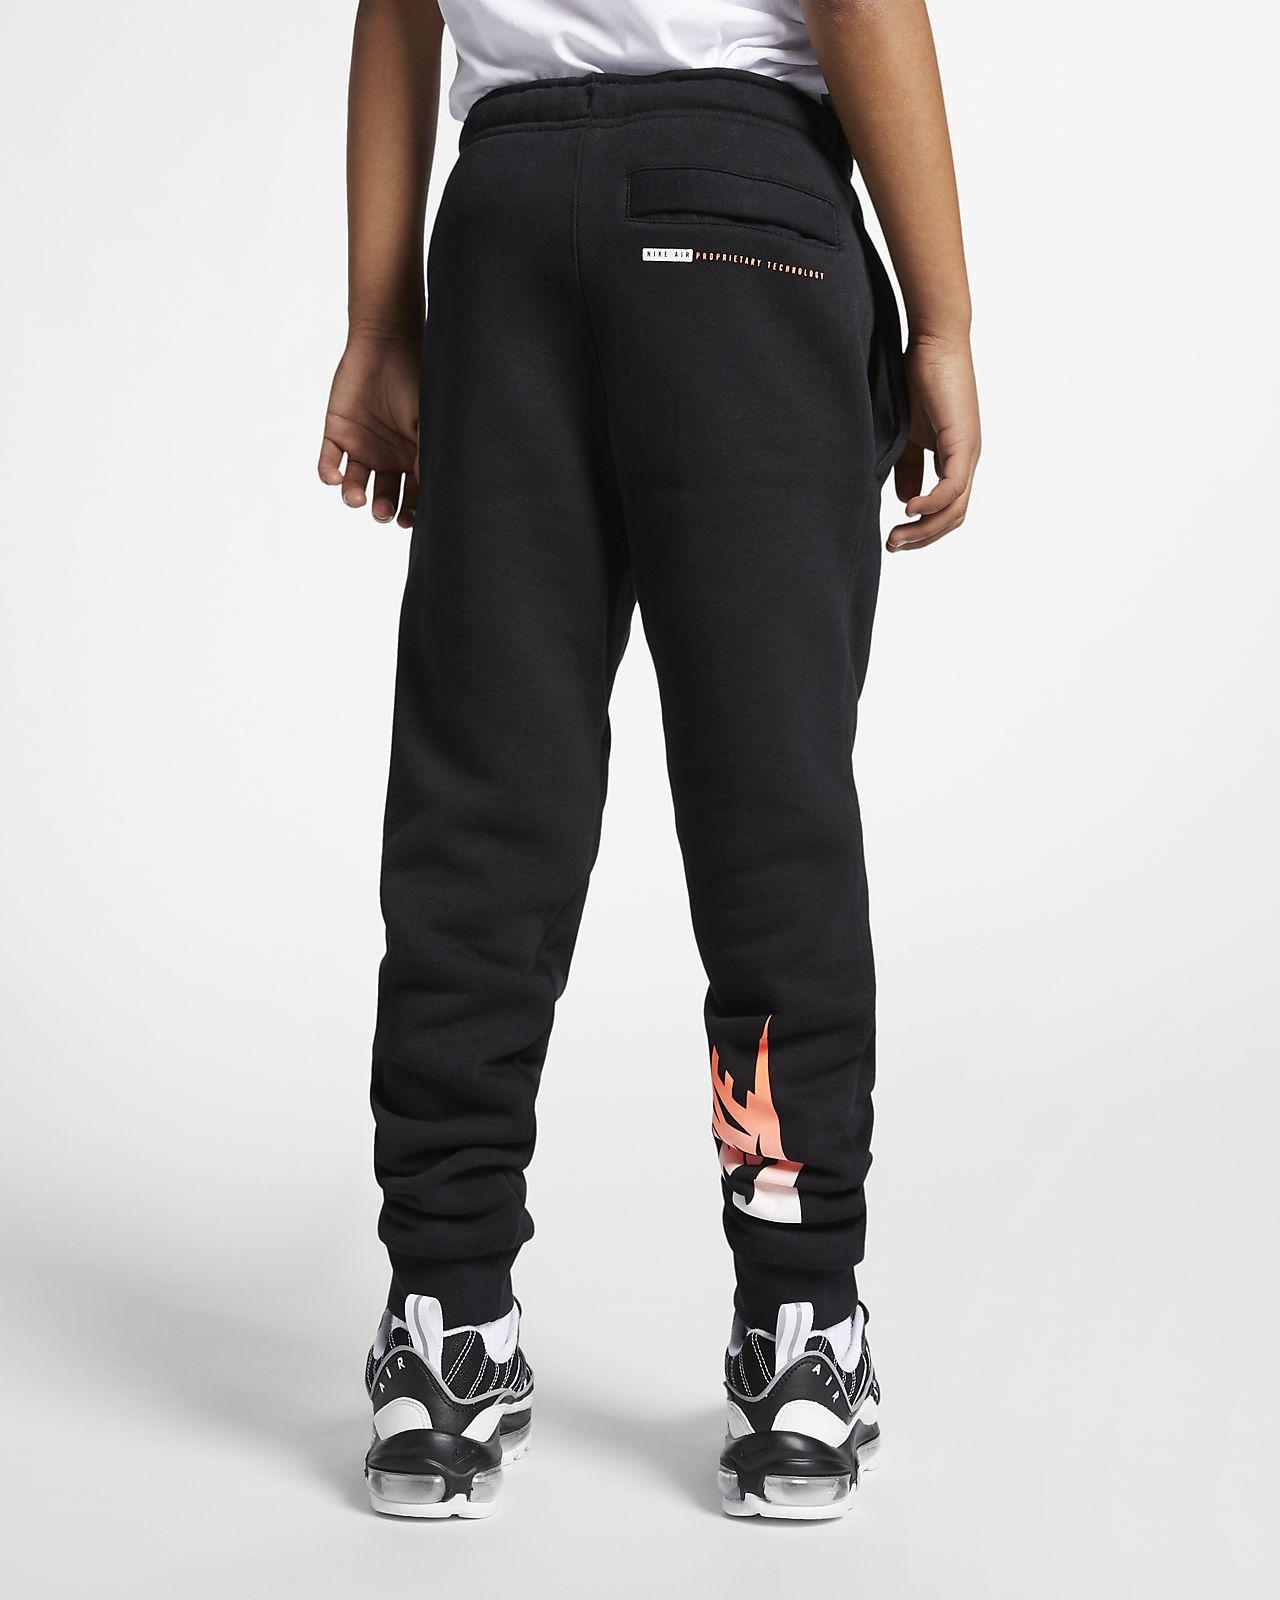 d54af4d331dbd2 Nike Sportswear Club Fleece Big Kids  (Boys ) Joggers. Nike.com